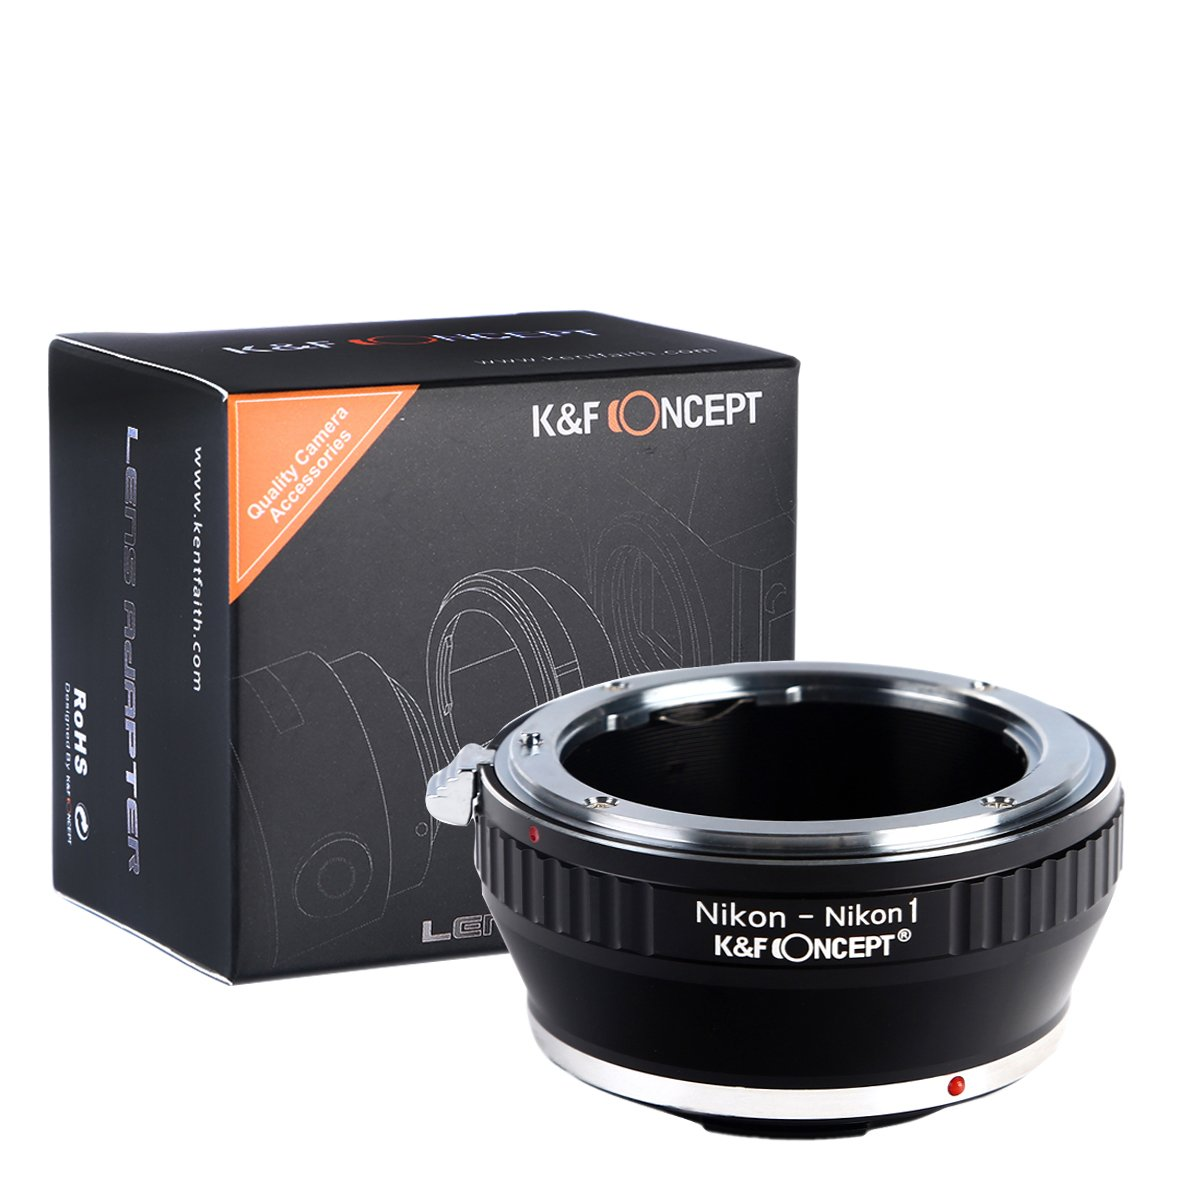 K&F Concept Lens Mount Adapter,Nikon F Mount Lens to Nikon 1-Series Camera, for Nikon V1, V2, J1, J2 Mirrorless Cameras